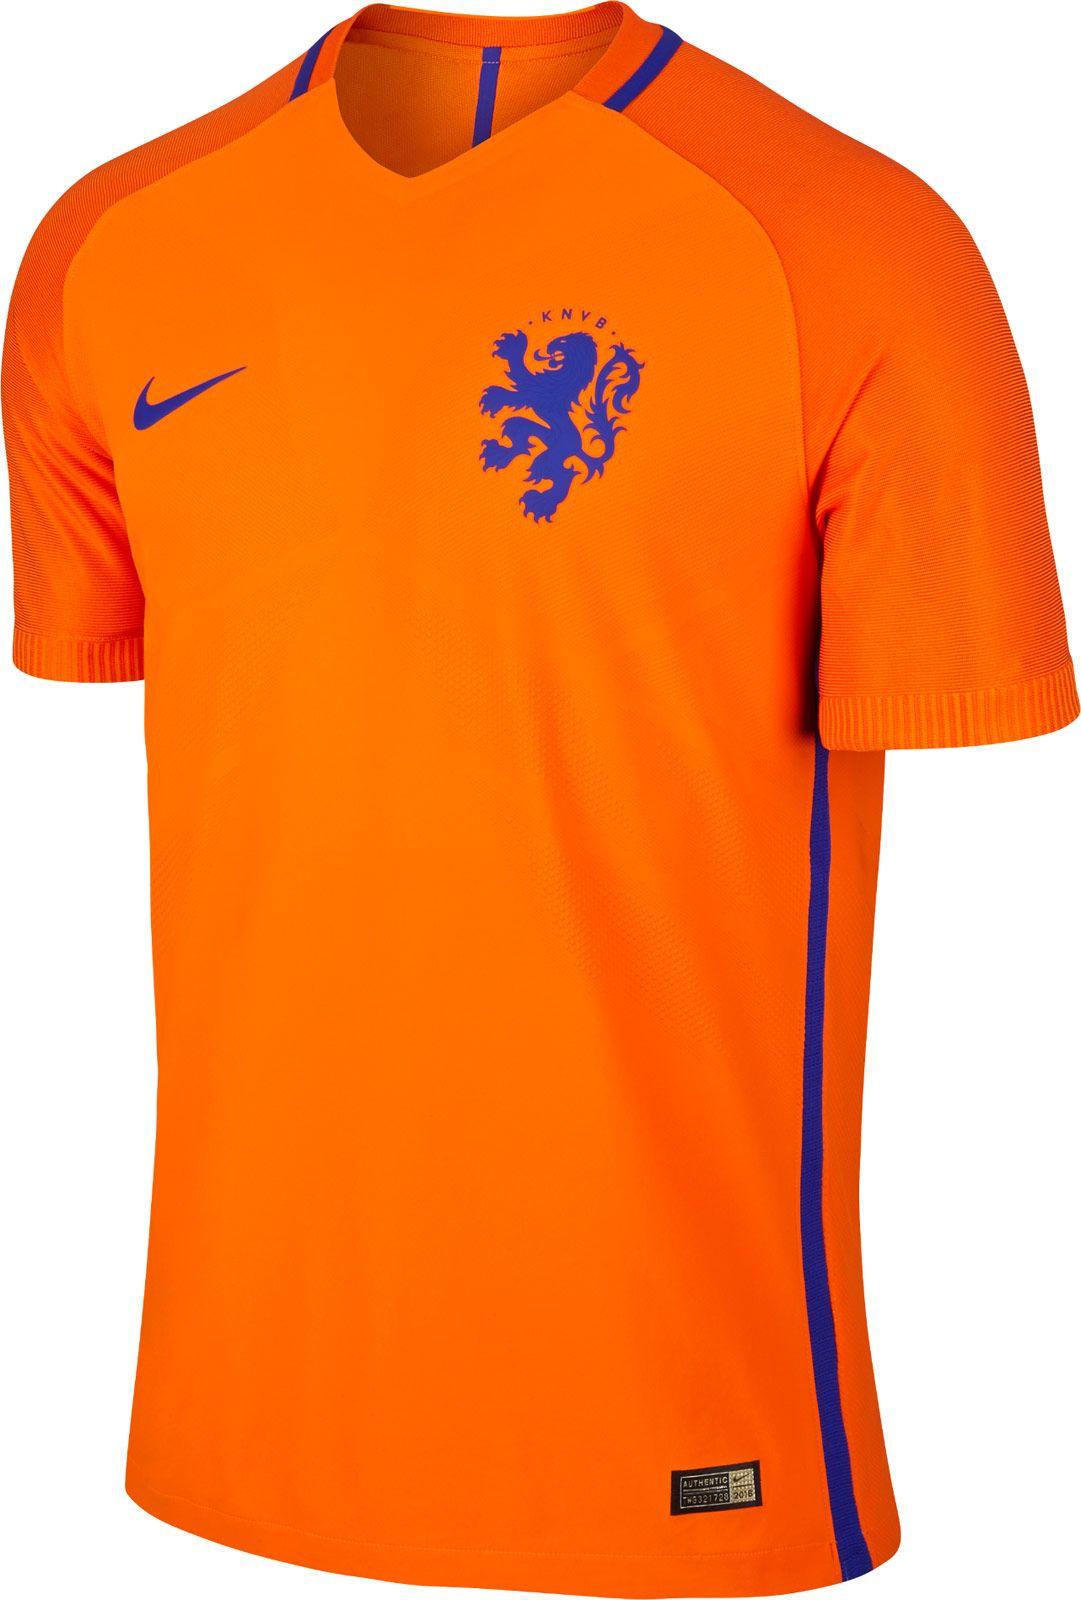 jersey de holanda 2016